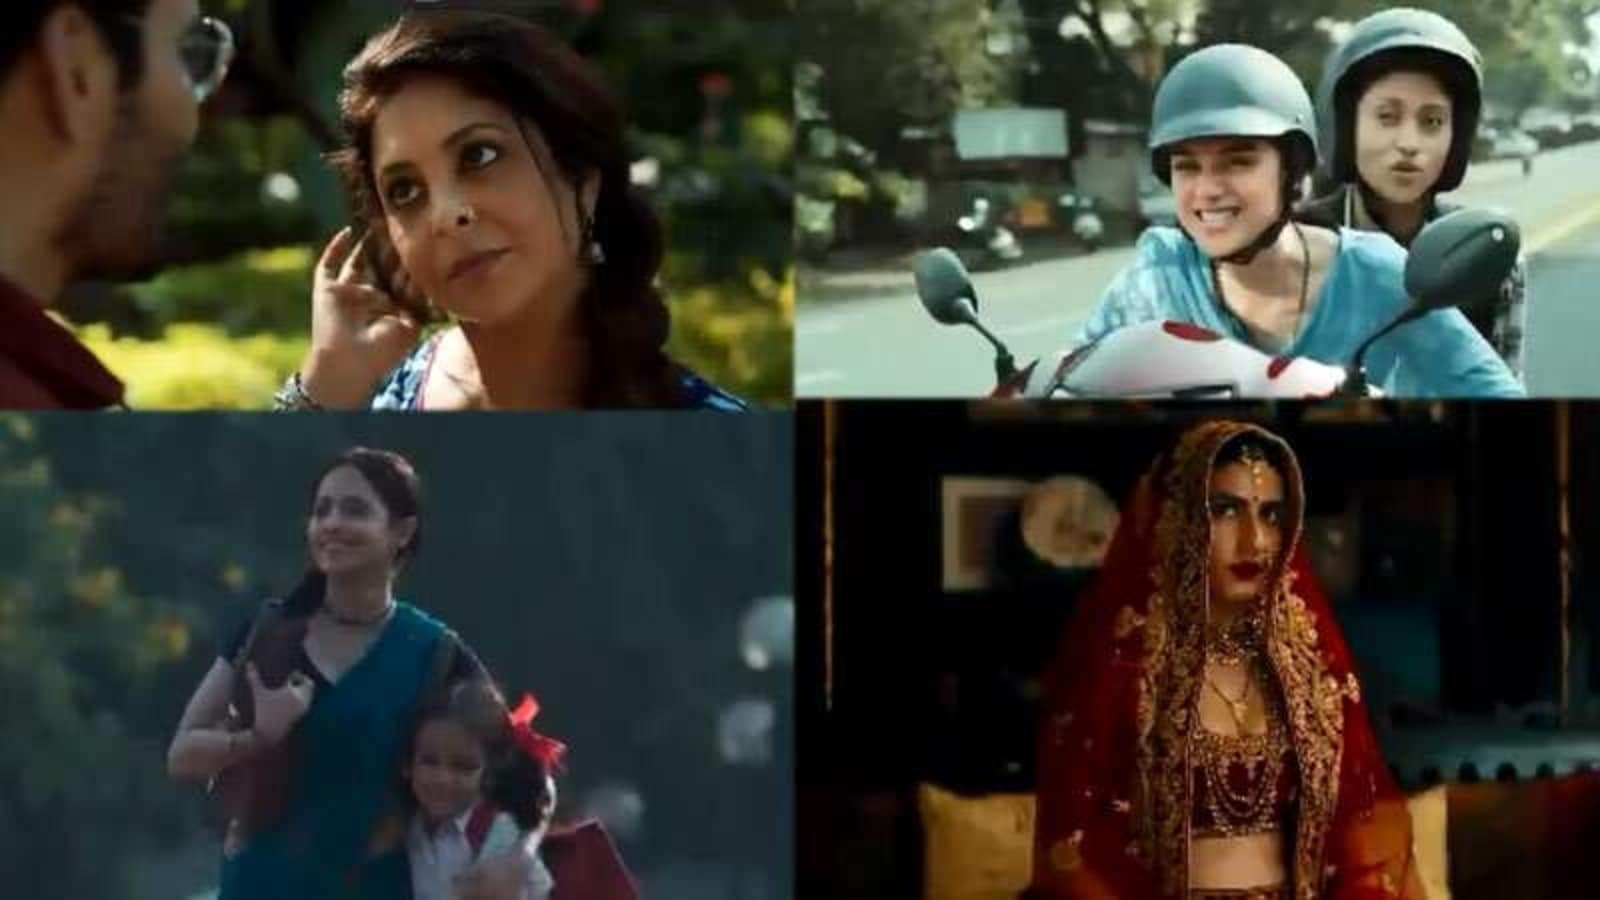 ajeeb daastaans, netflix, film, review, hindi, 2021